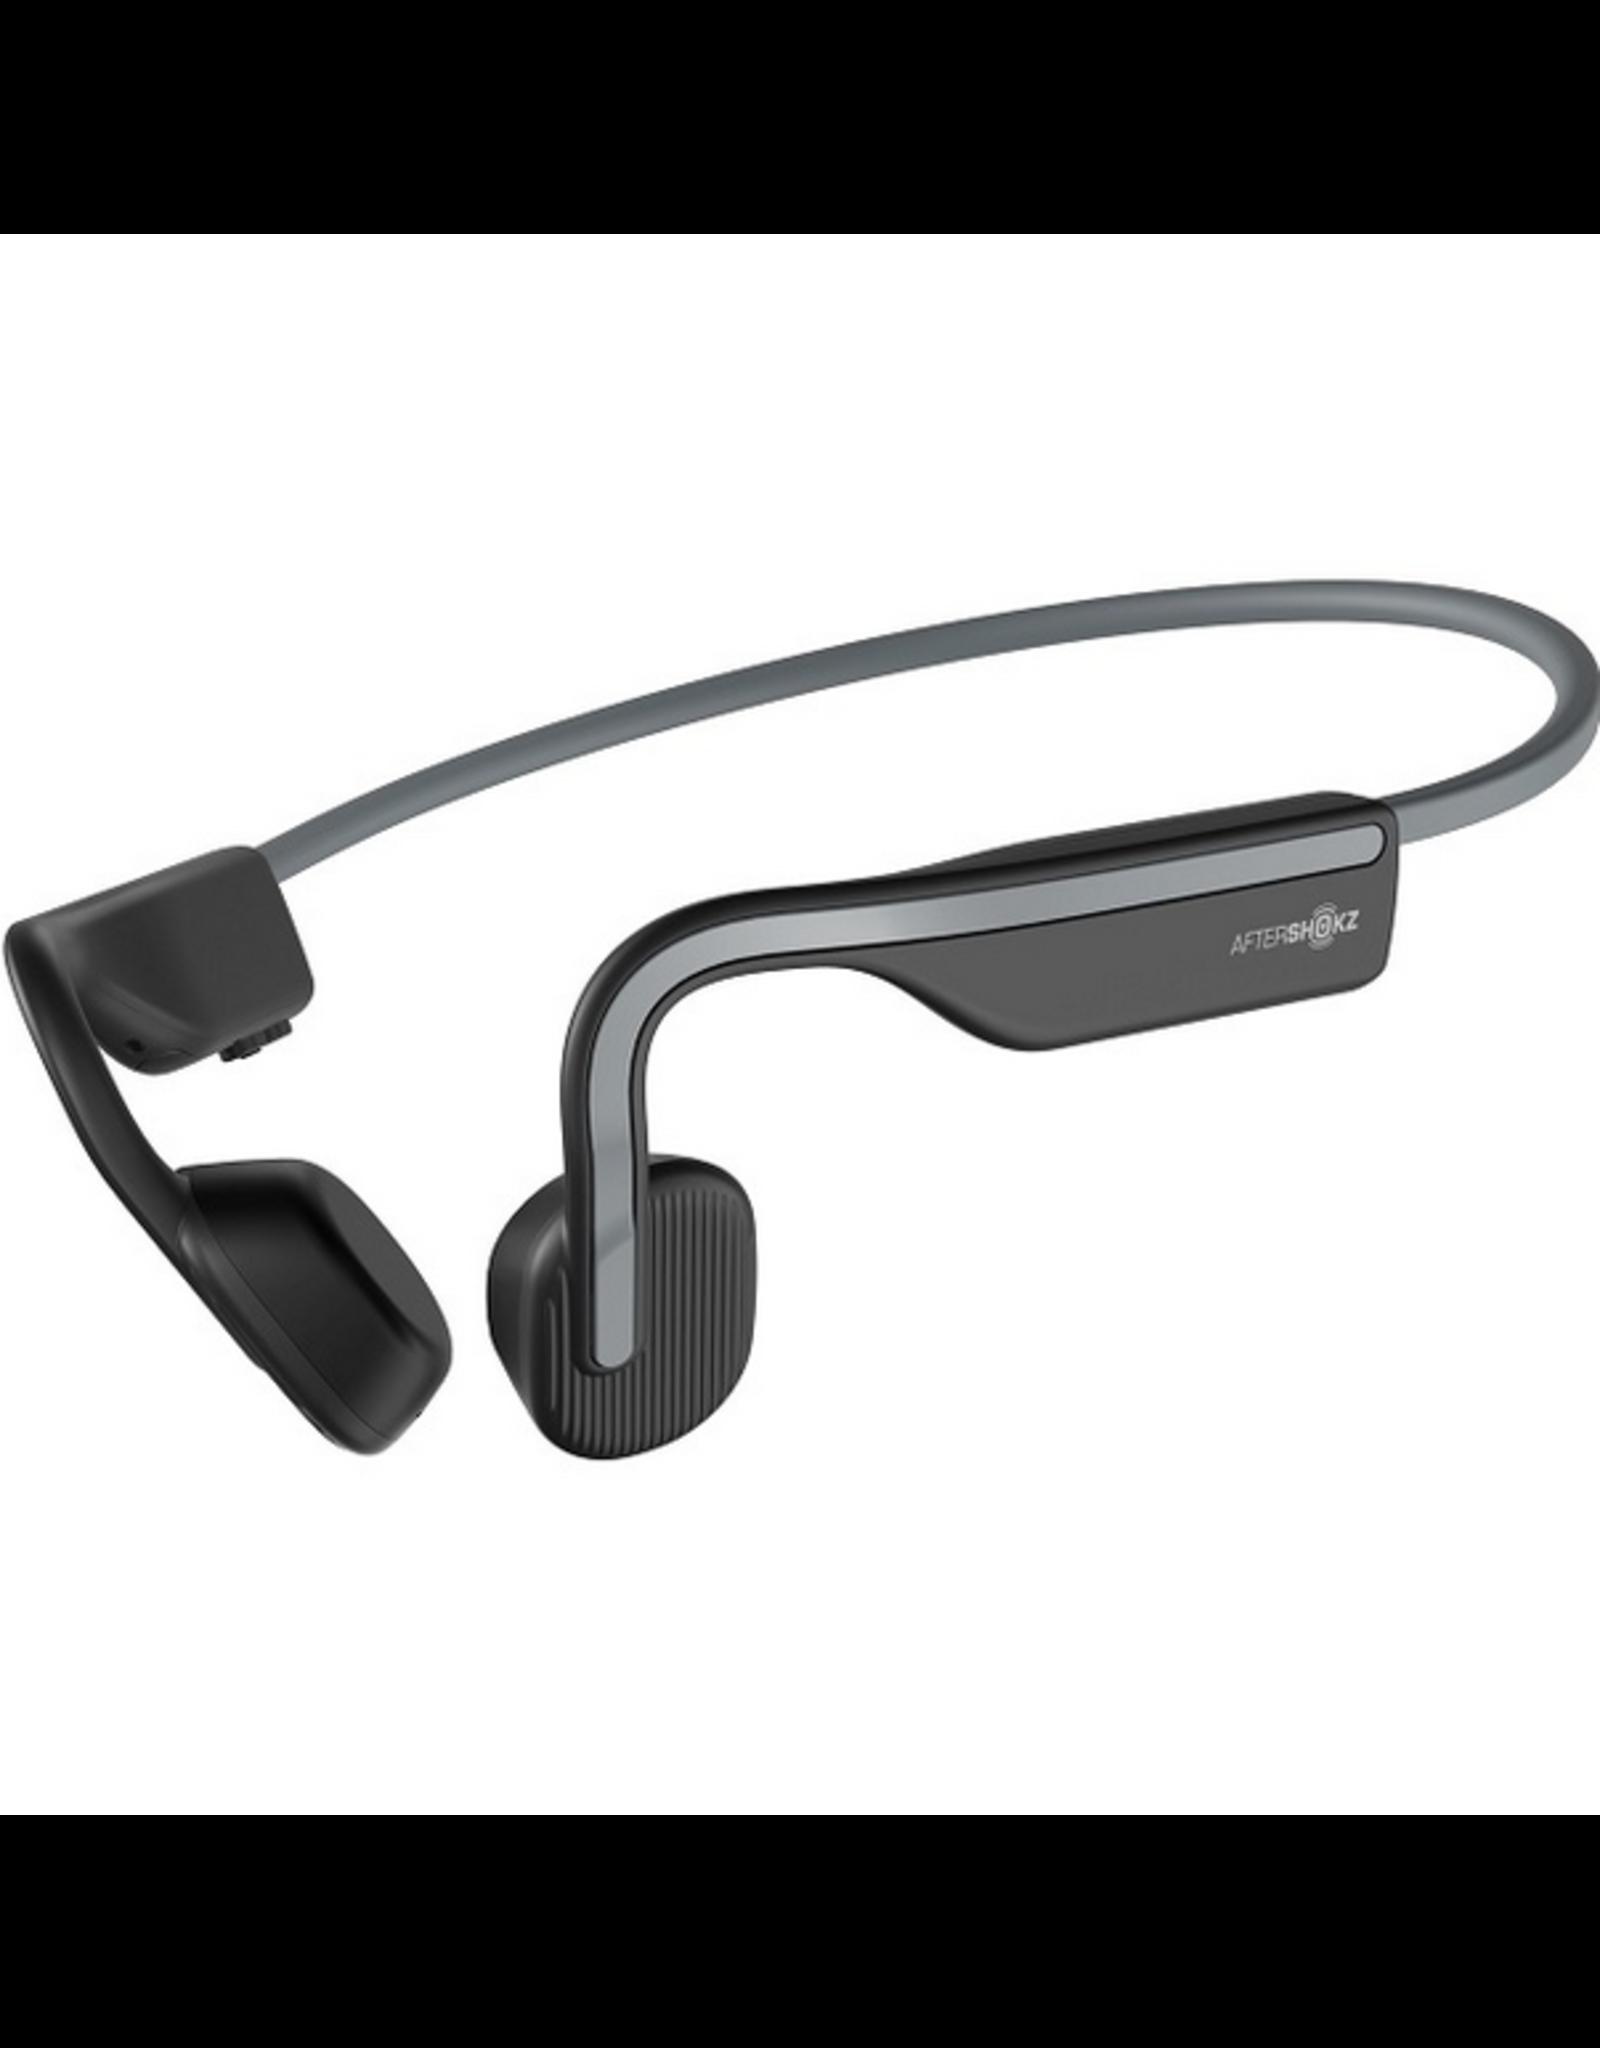 Aftershokz Aftershokz Open Move Bluetooth Headphones Slate Grey w/Mic SKU:50603